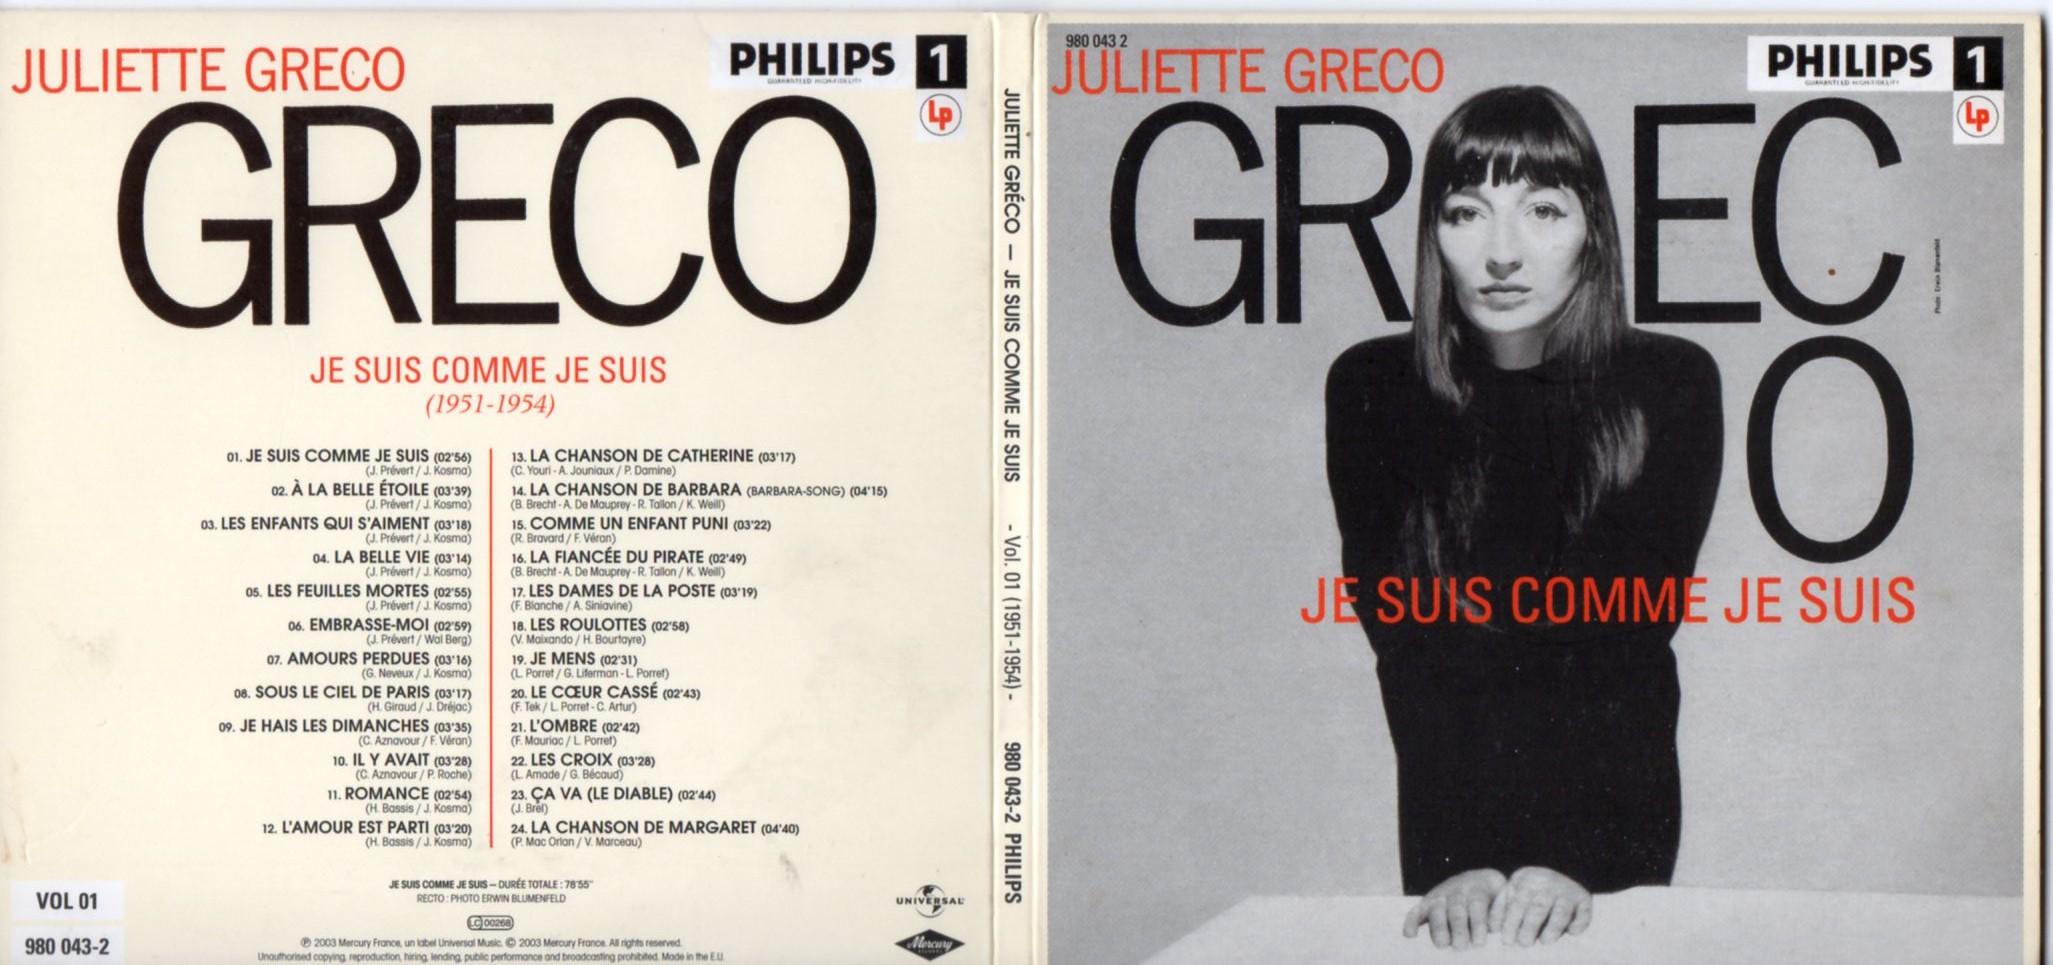 JULIETTE GRÉCO - Je suis comme je suis (1951-1954) Gatefold Card board sleeve - CD